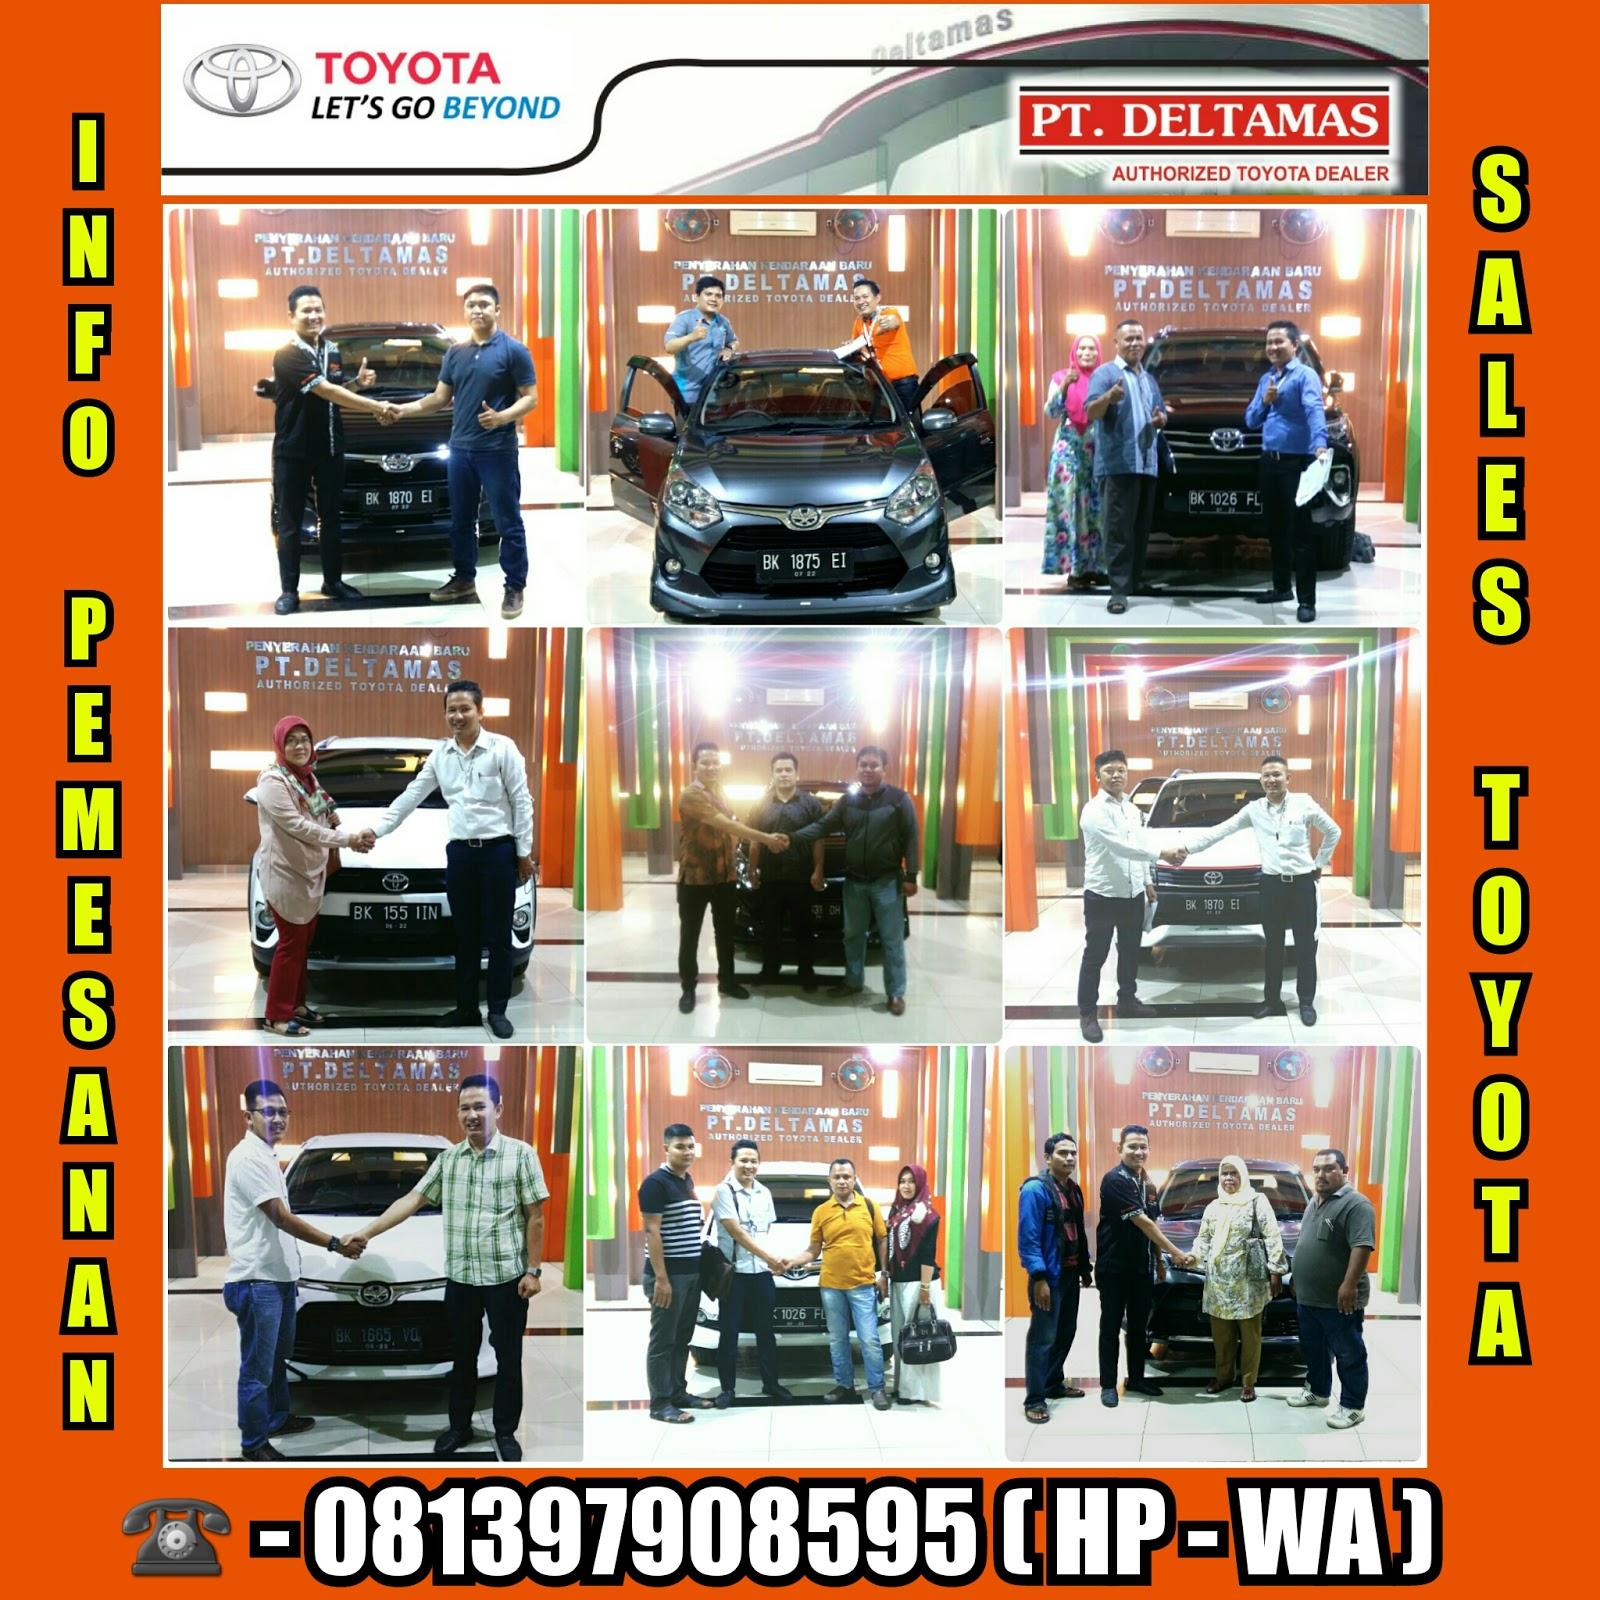 Toyota Deltamas Medan Booking Fee New Agya Trd A T Giias 2018 Open Indent Allnew Voxy